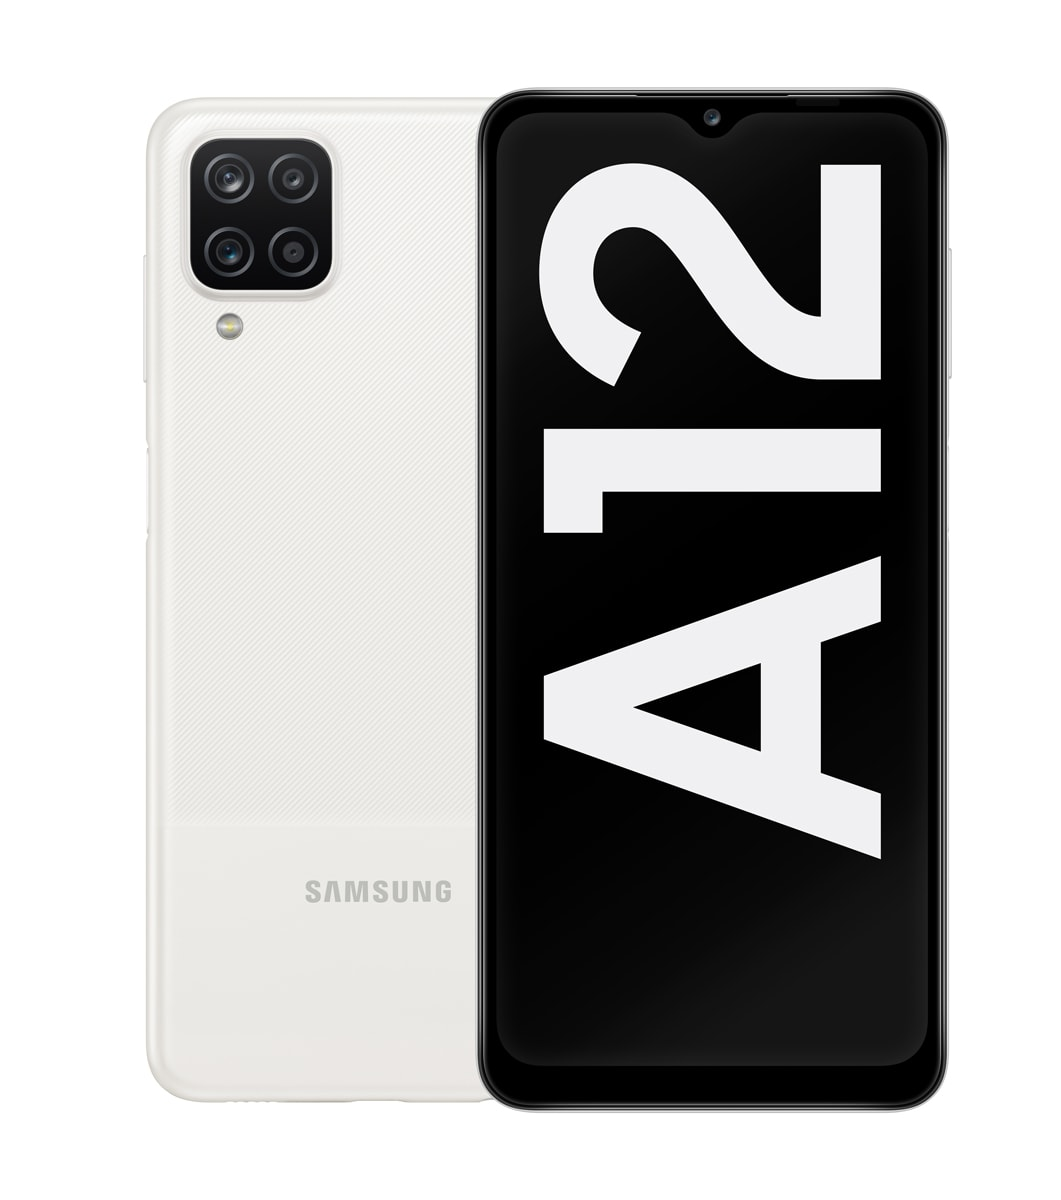 Samsung_Galaxy_A12_SM-A125F_White-_Single-Cut-Out_RGB